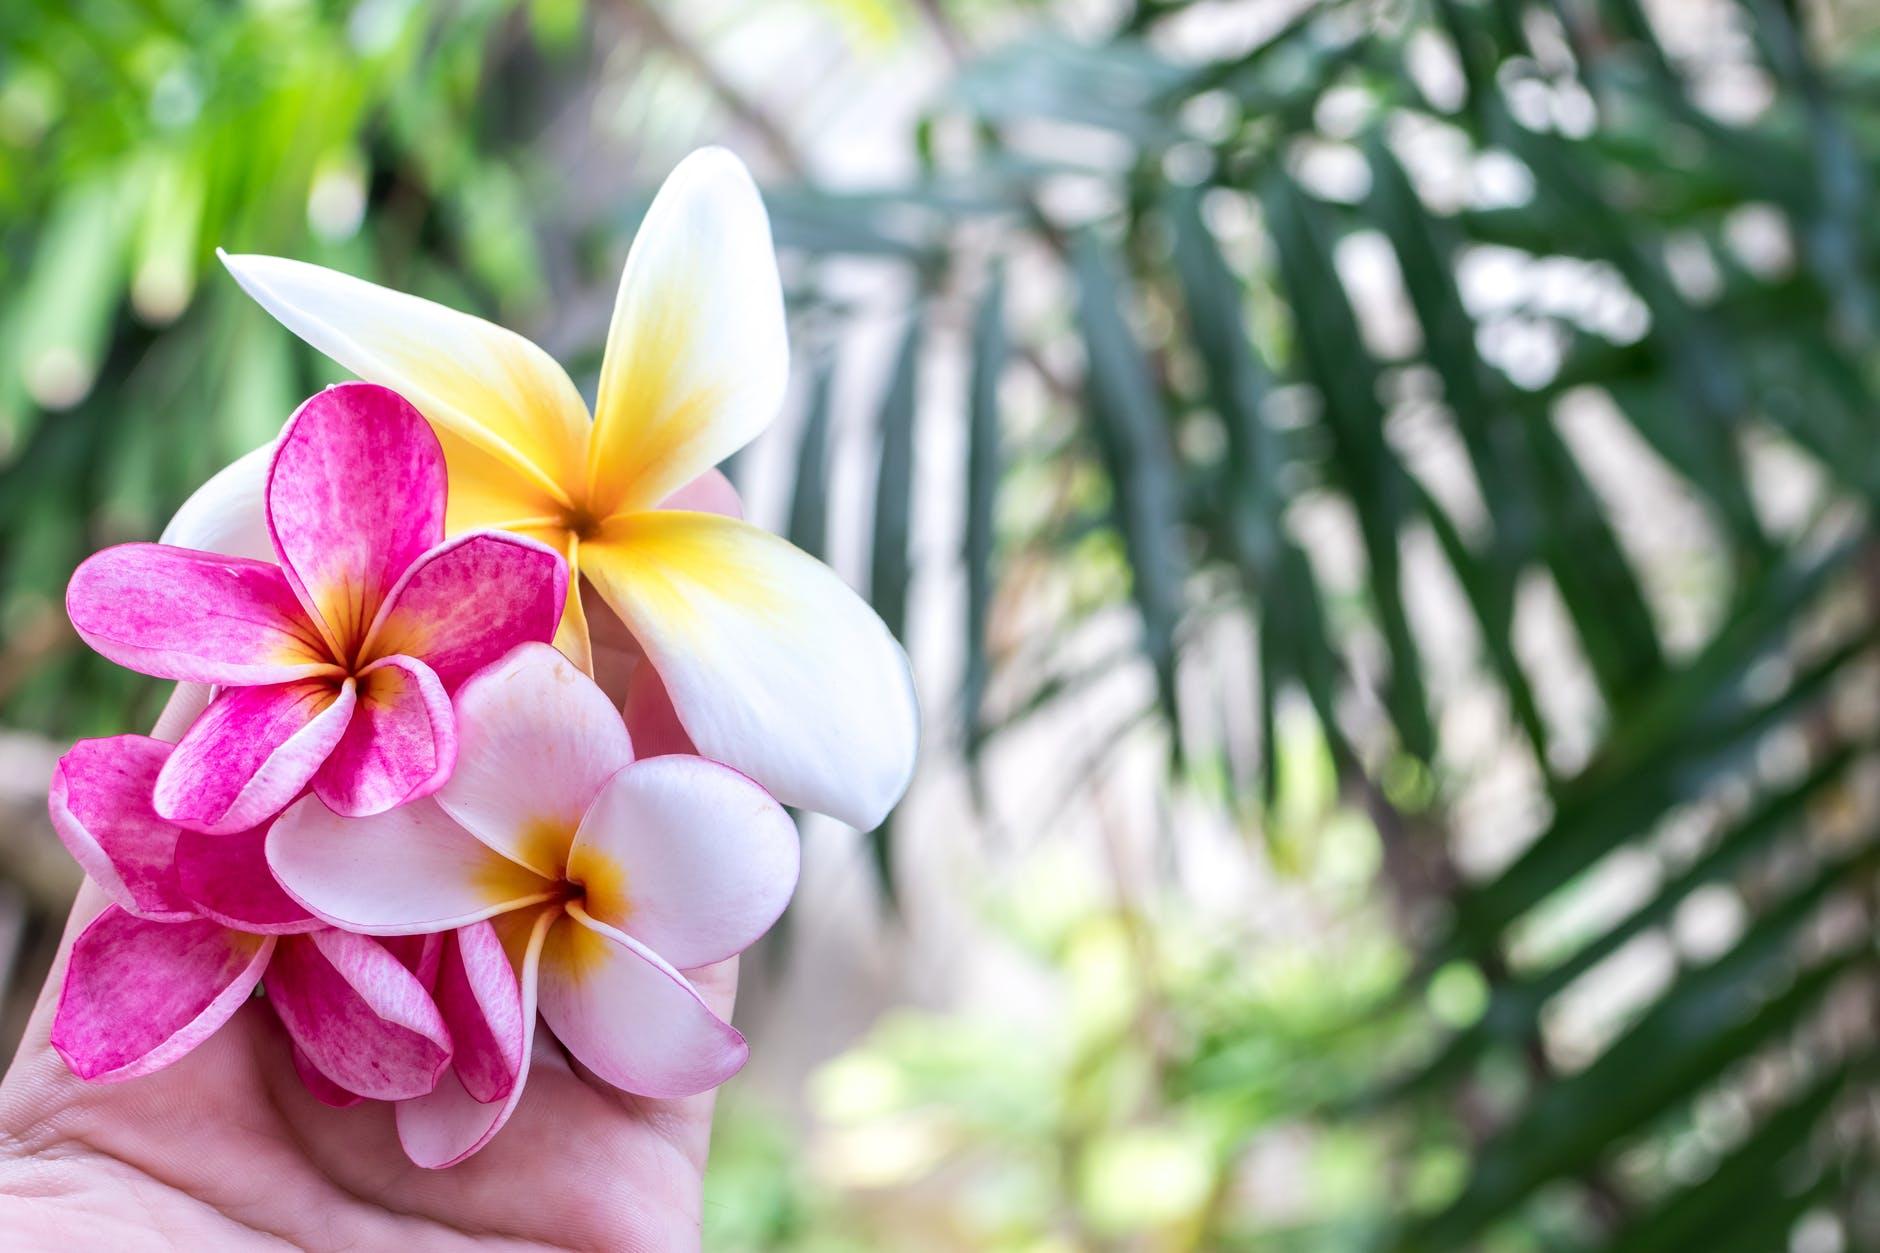 bali beautiful beauty bloom